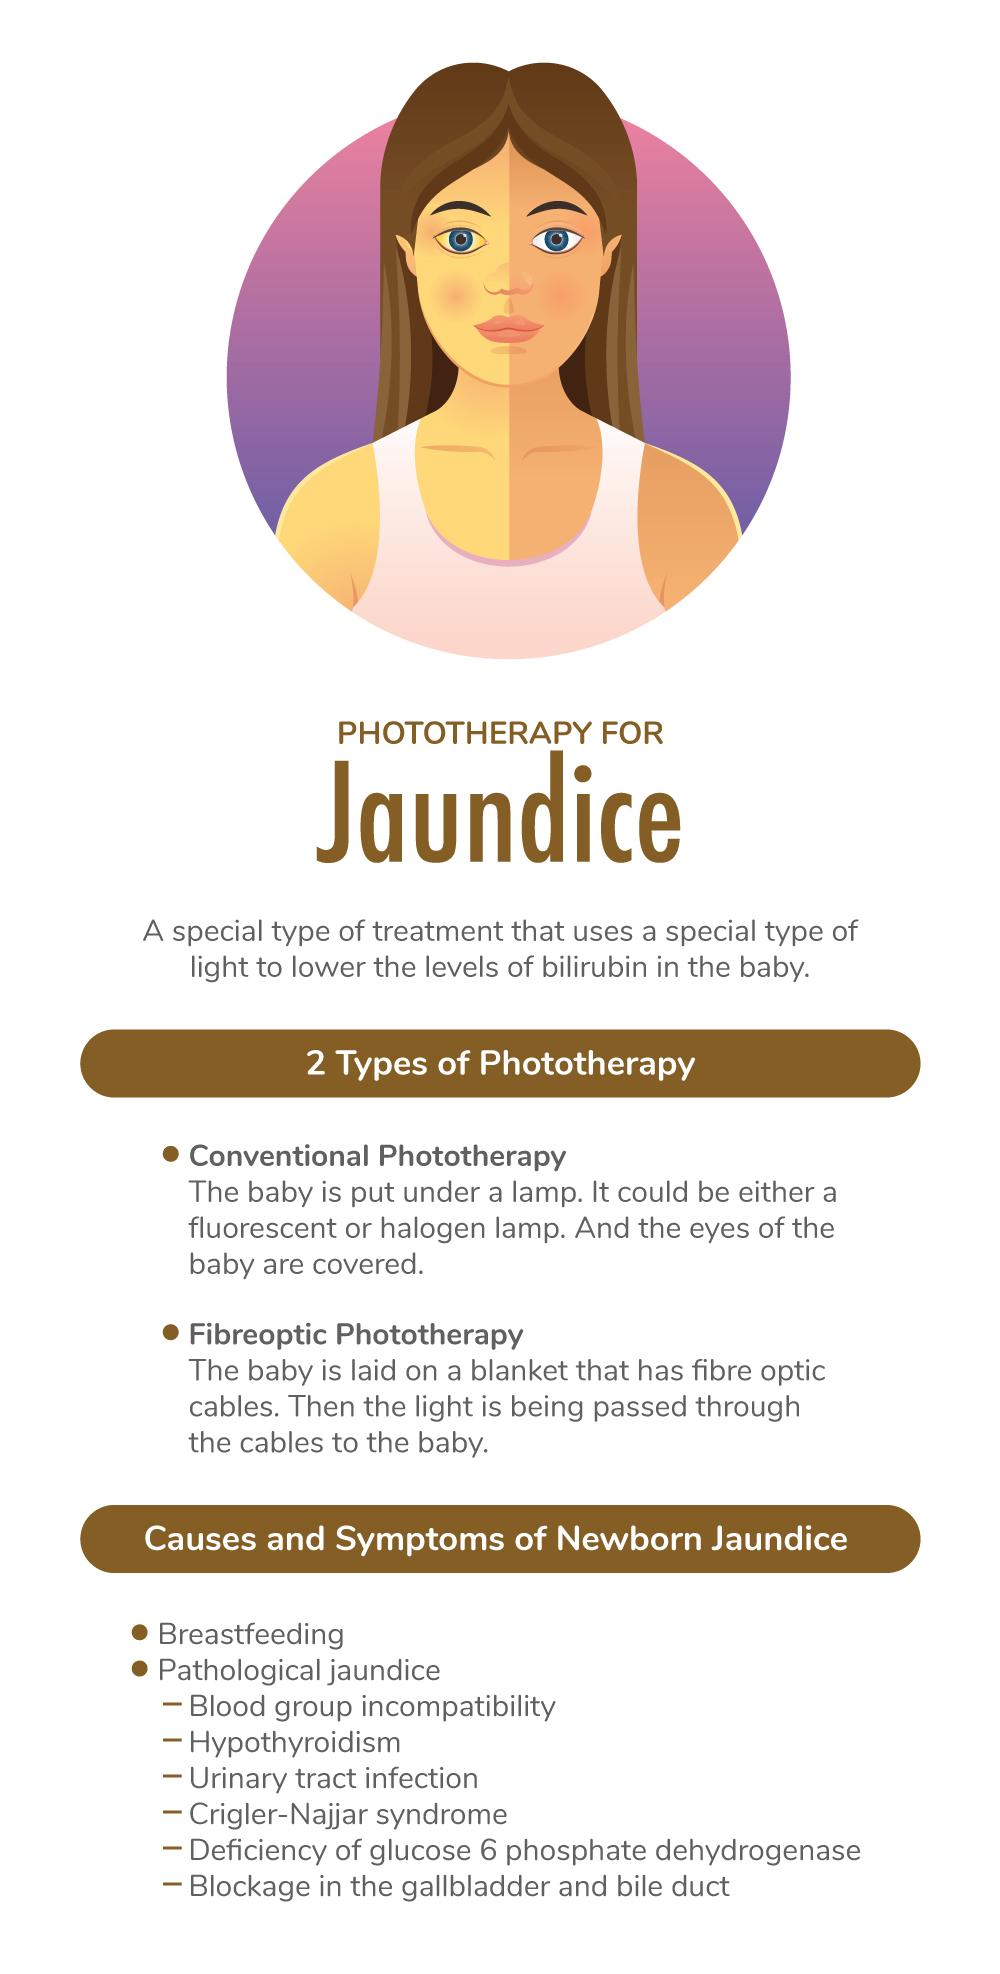 Phototherapy for jaundice